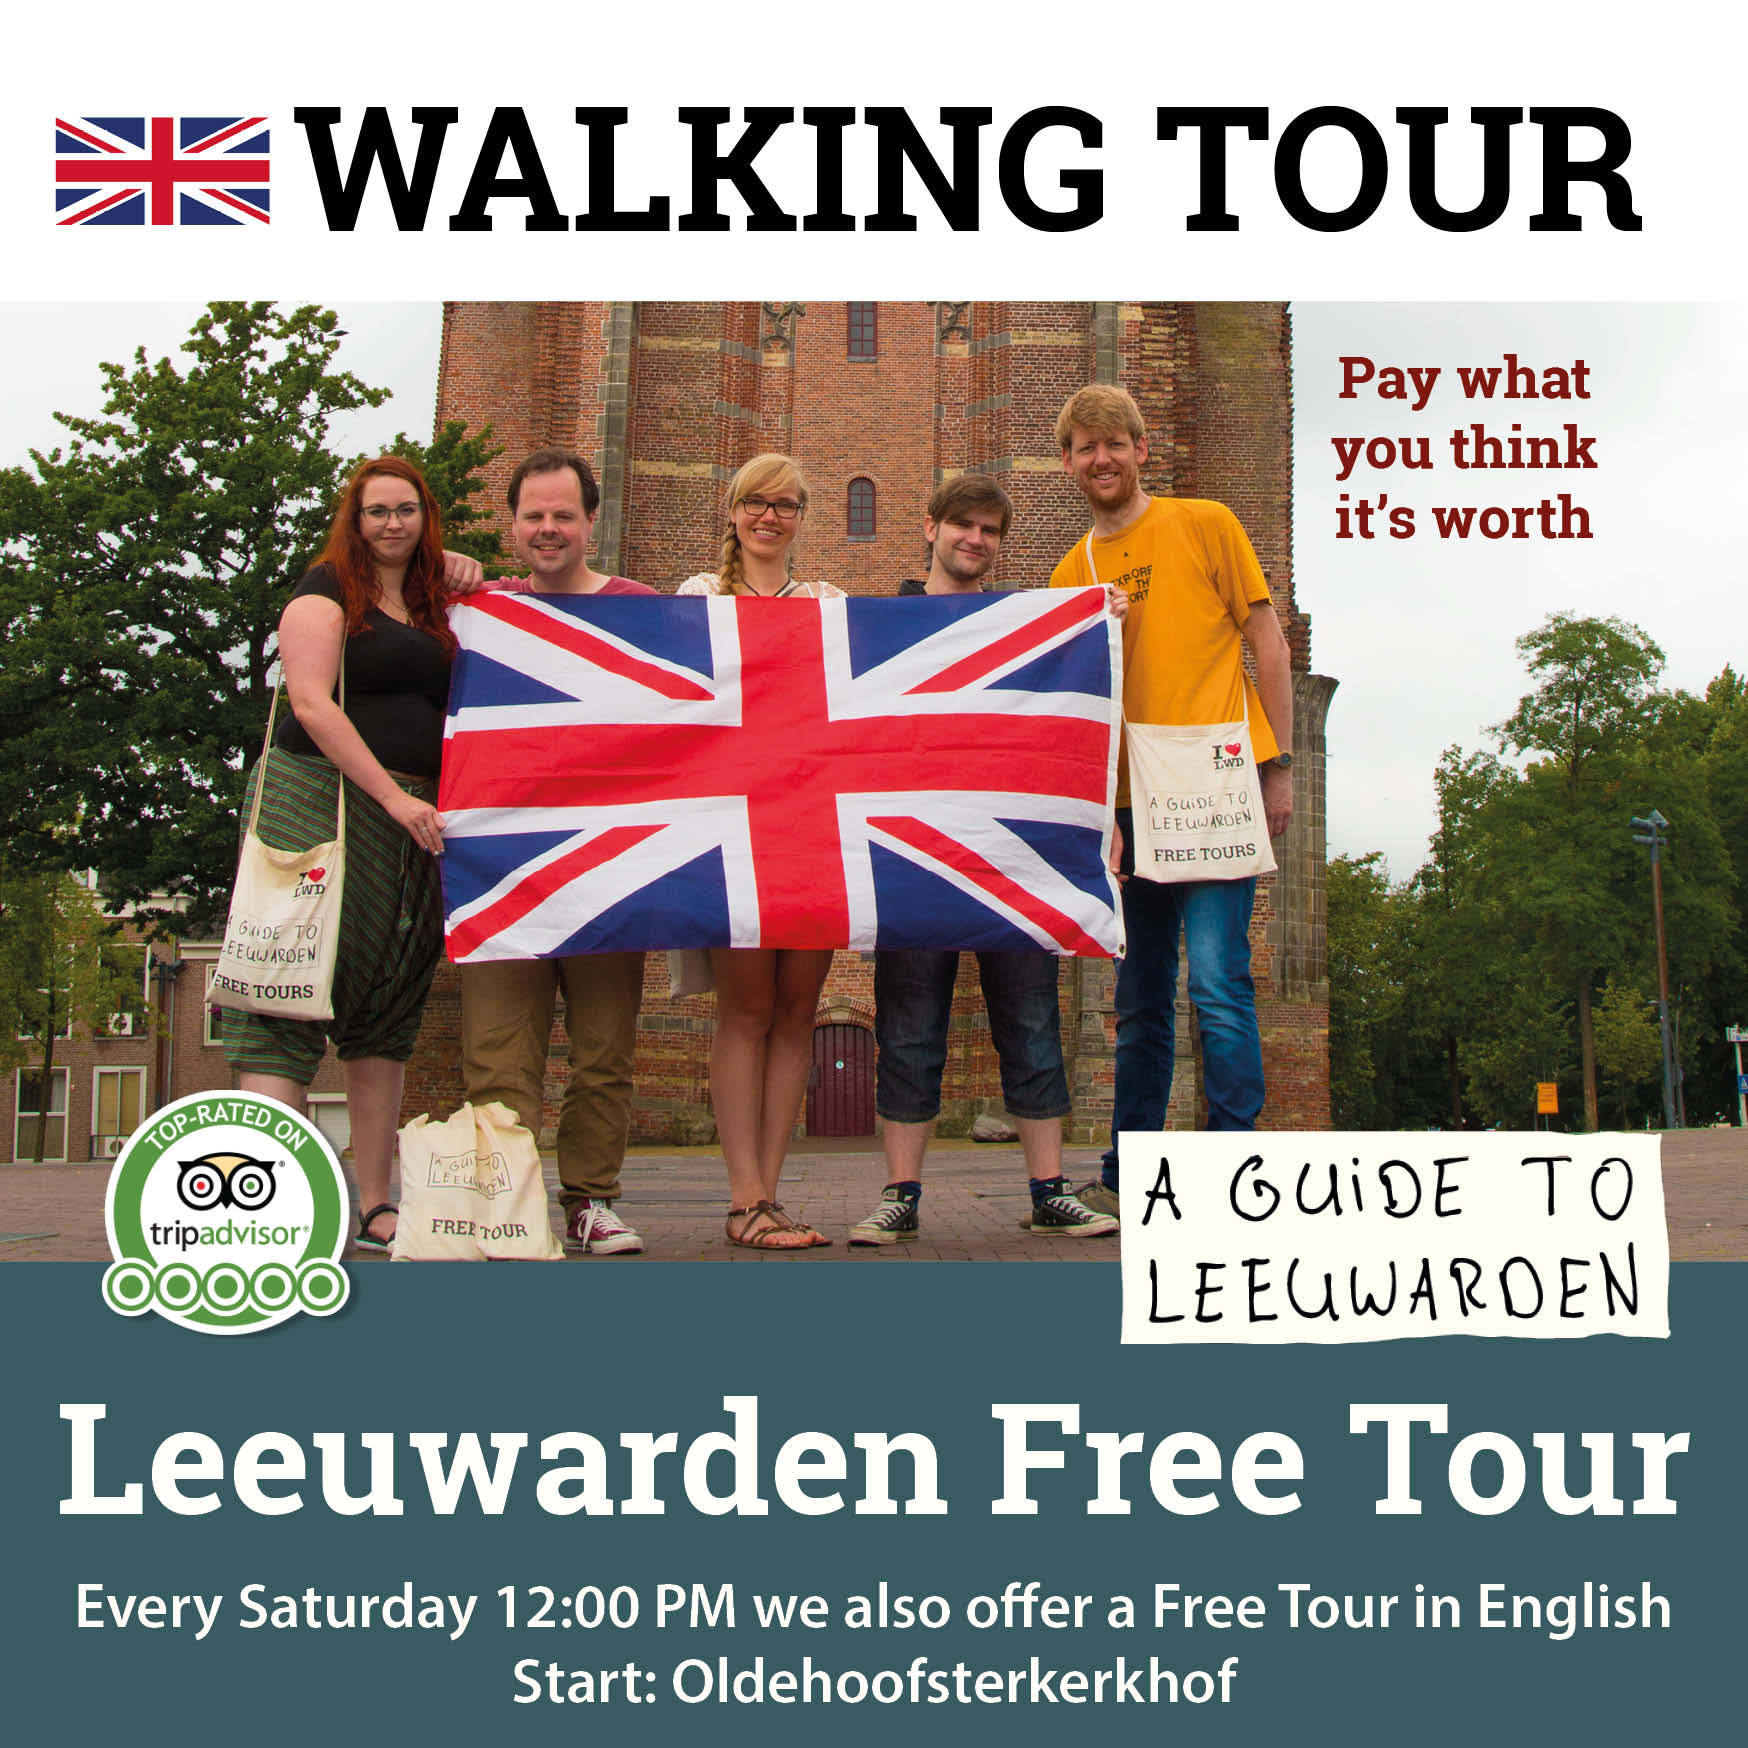 Leeuwarden Free Tour in English